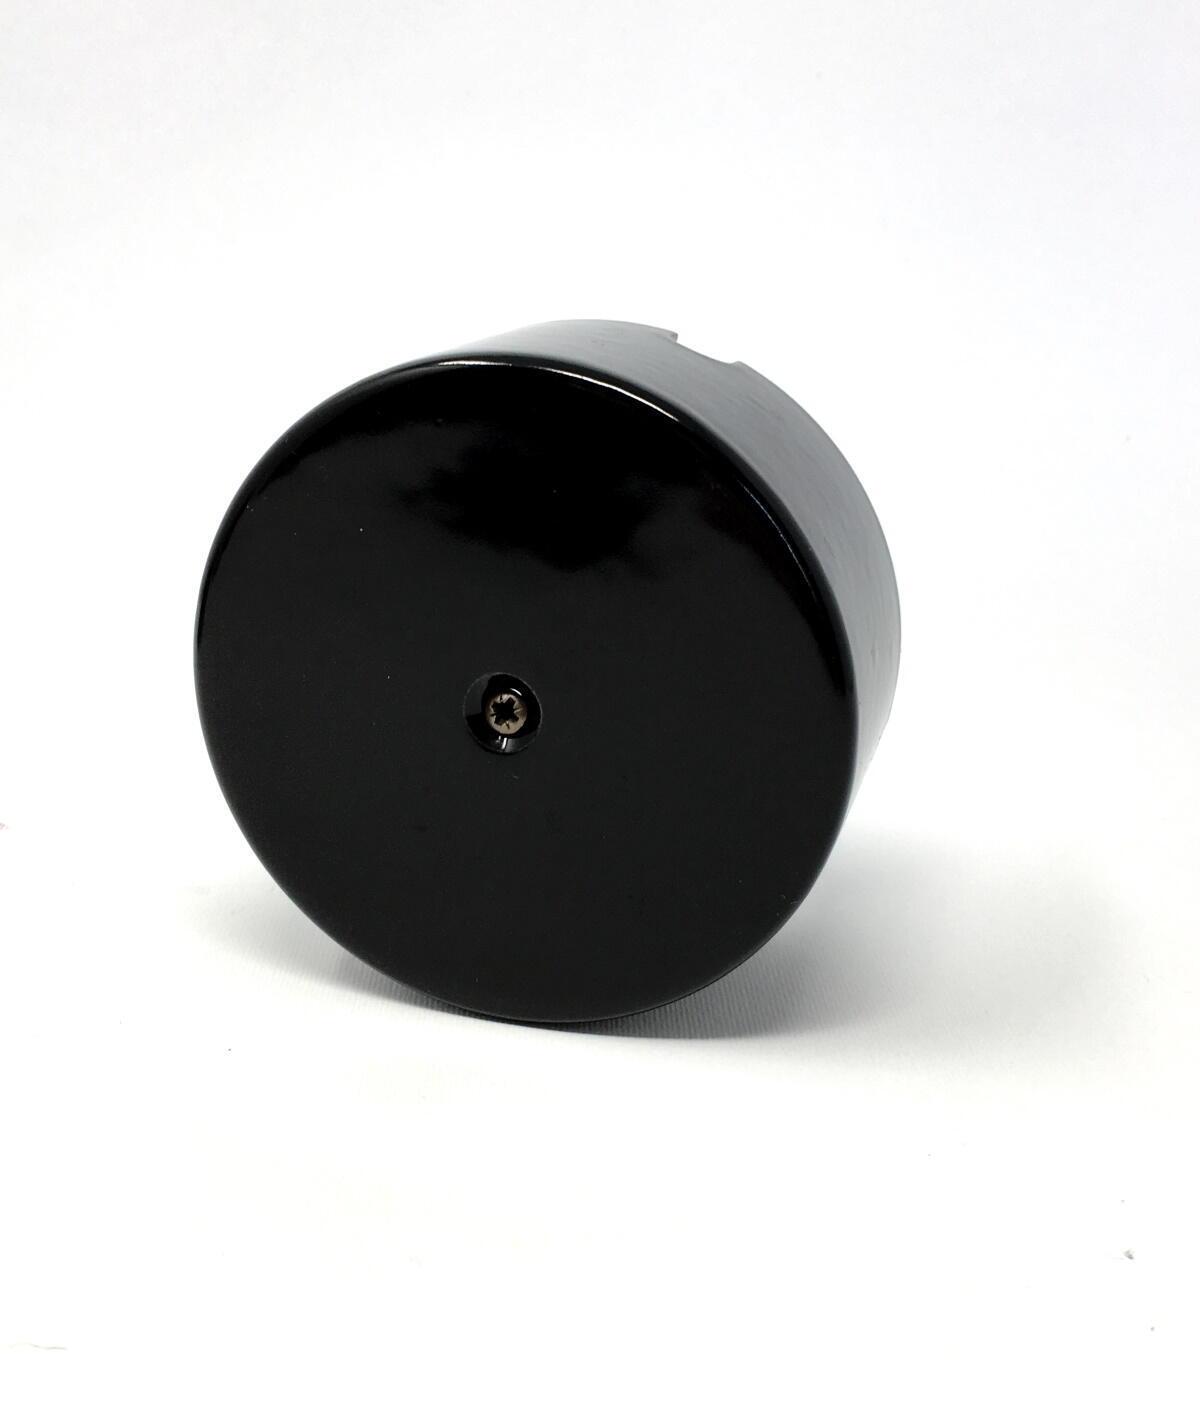 Scatola di derivazione per parete 100 x 100x 50 mm Ø 100 mm